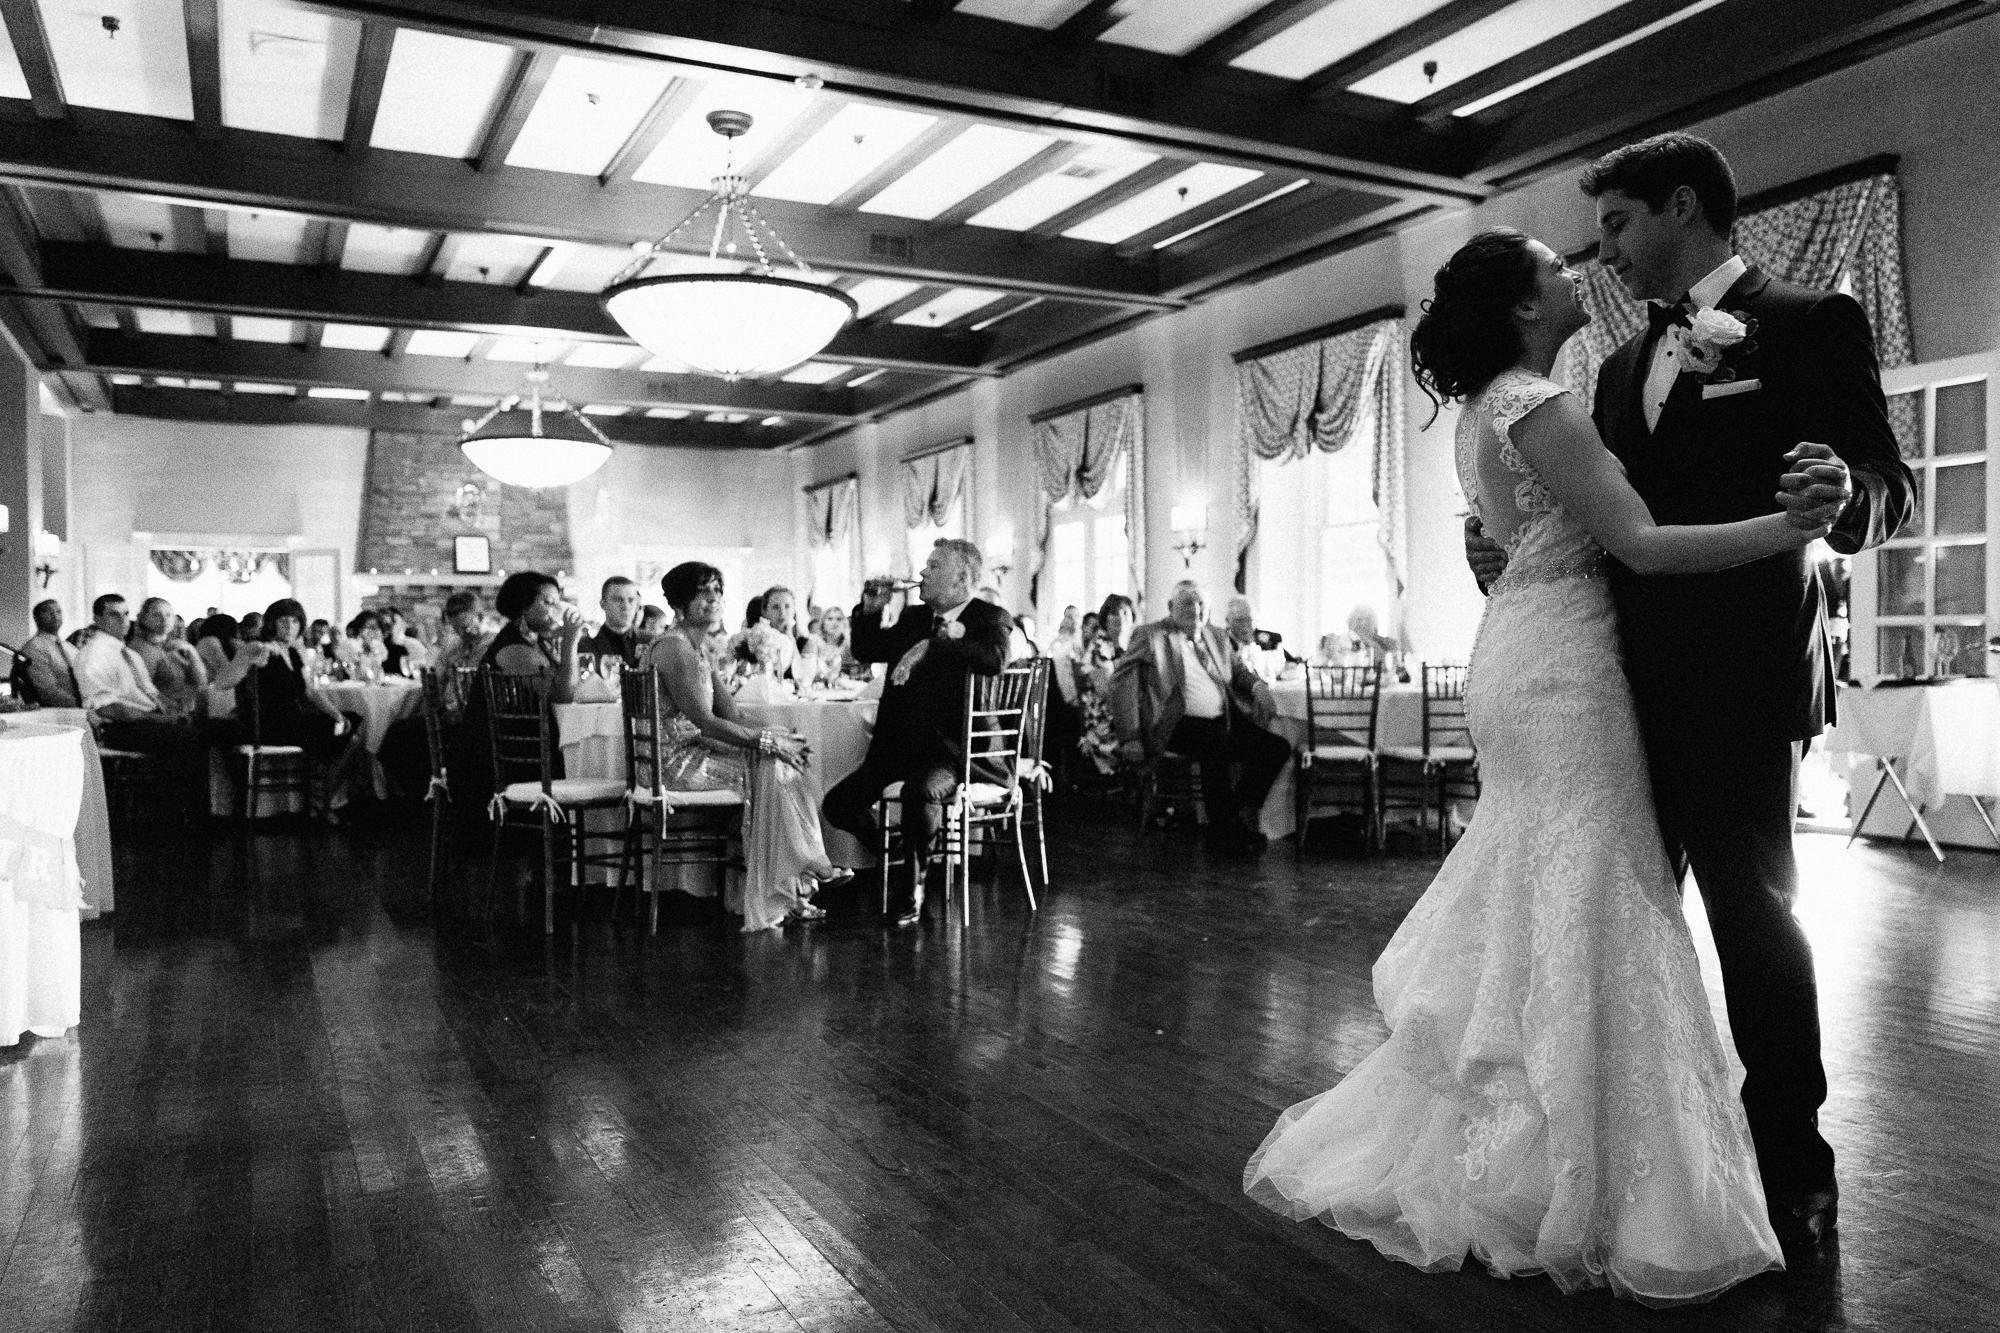 scranton-wedding-photography-zak-zavada-2016.06-rebeccaIan-0686.jpg